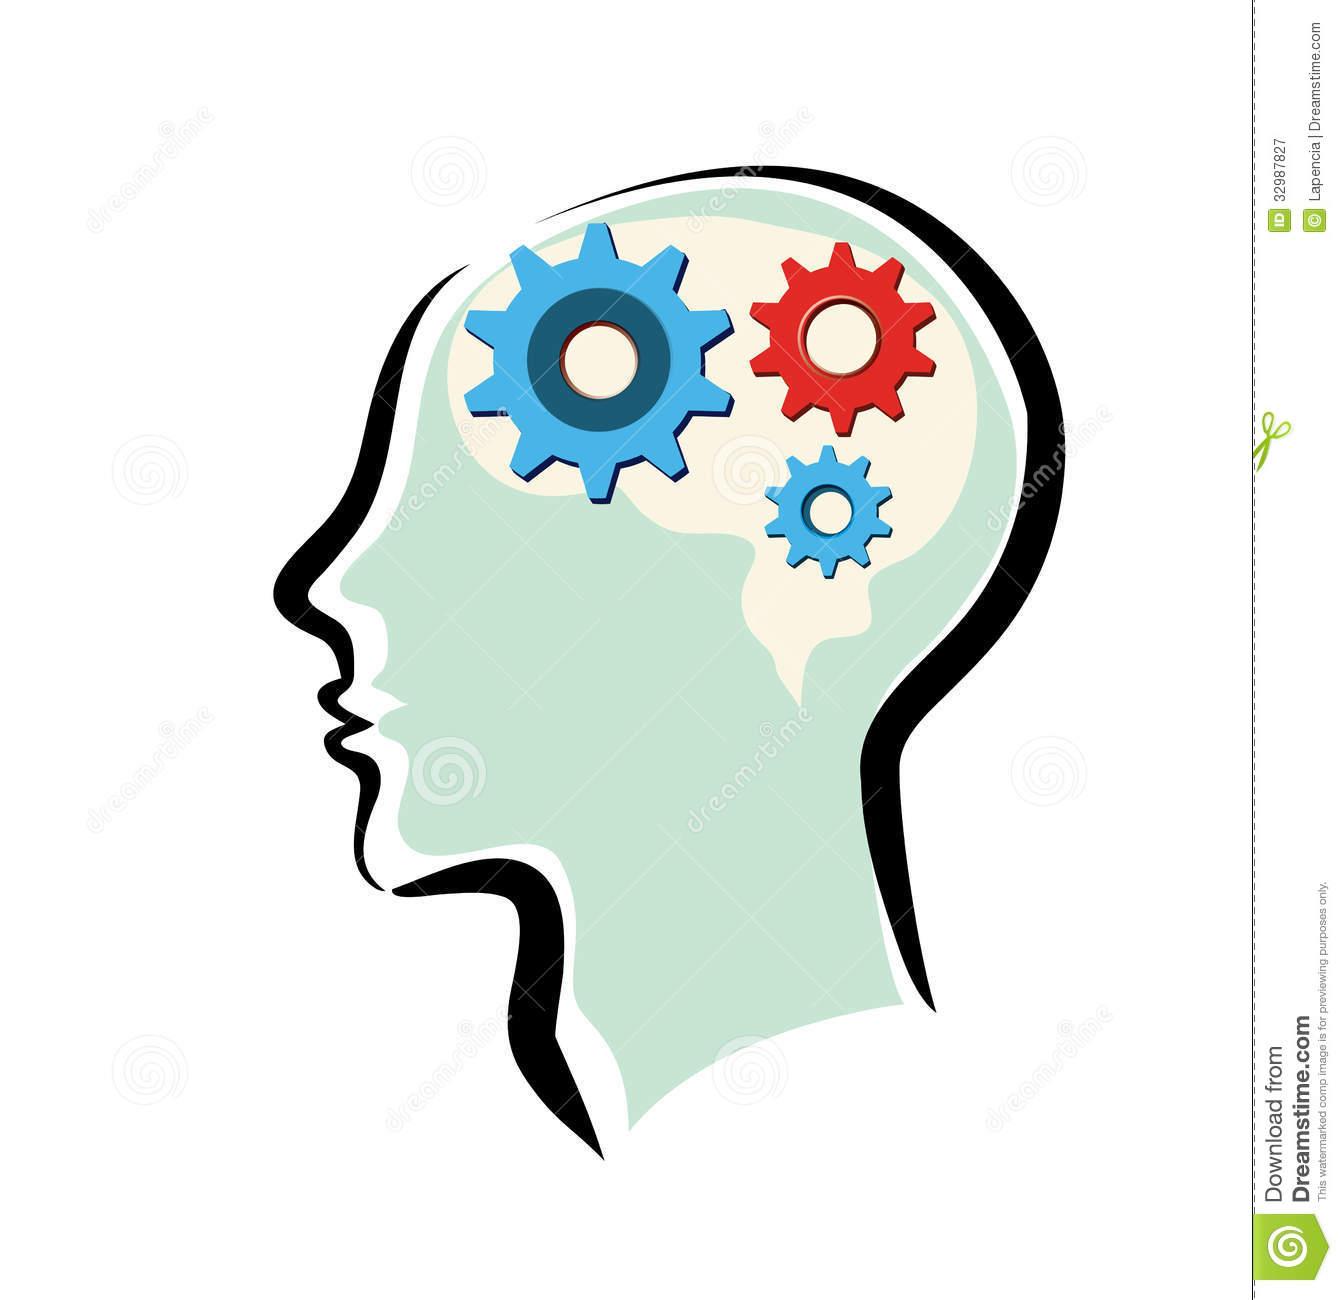 1342x1300 Free Clipart Brain Thinking